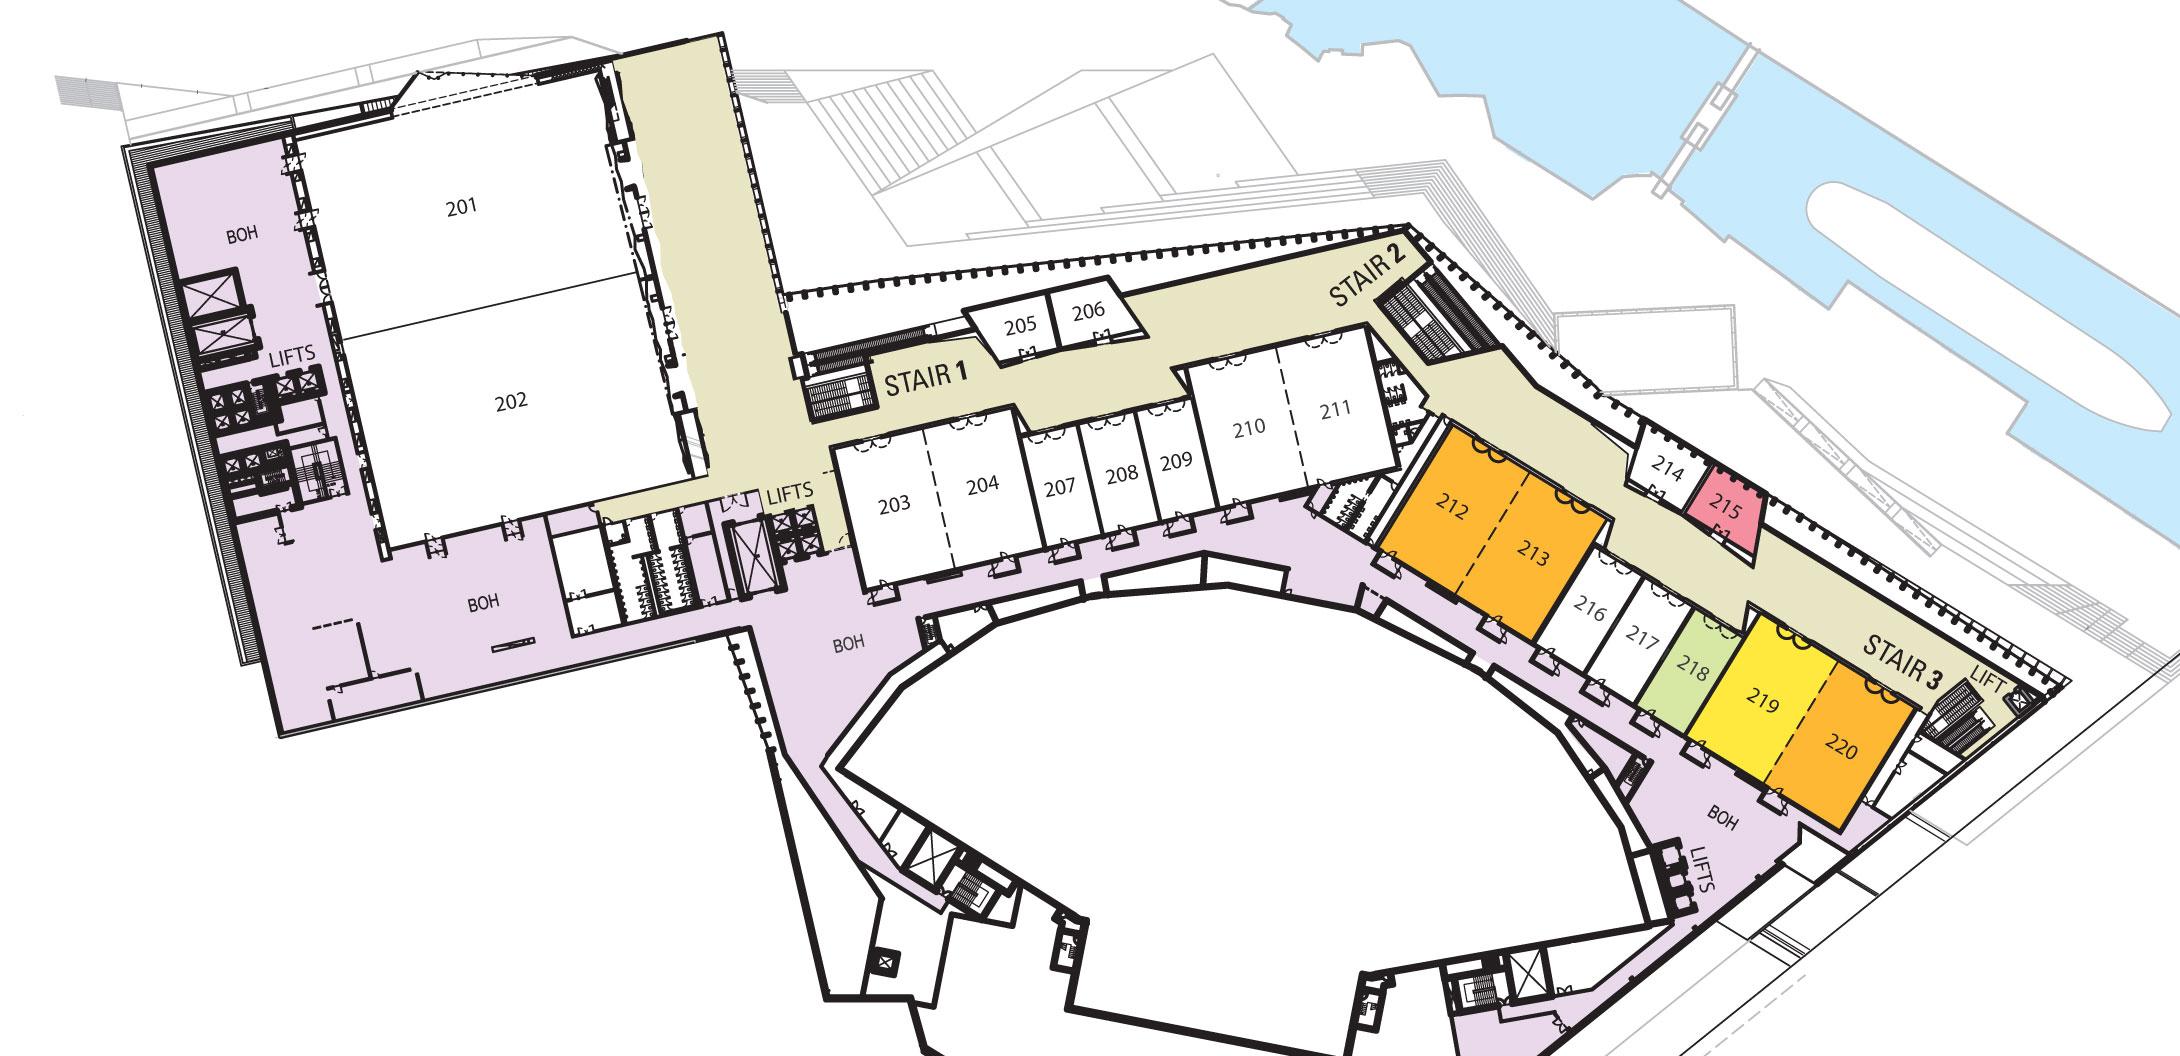 D Exhibition Floor Plan : Venue floor plans